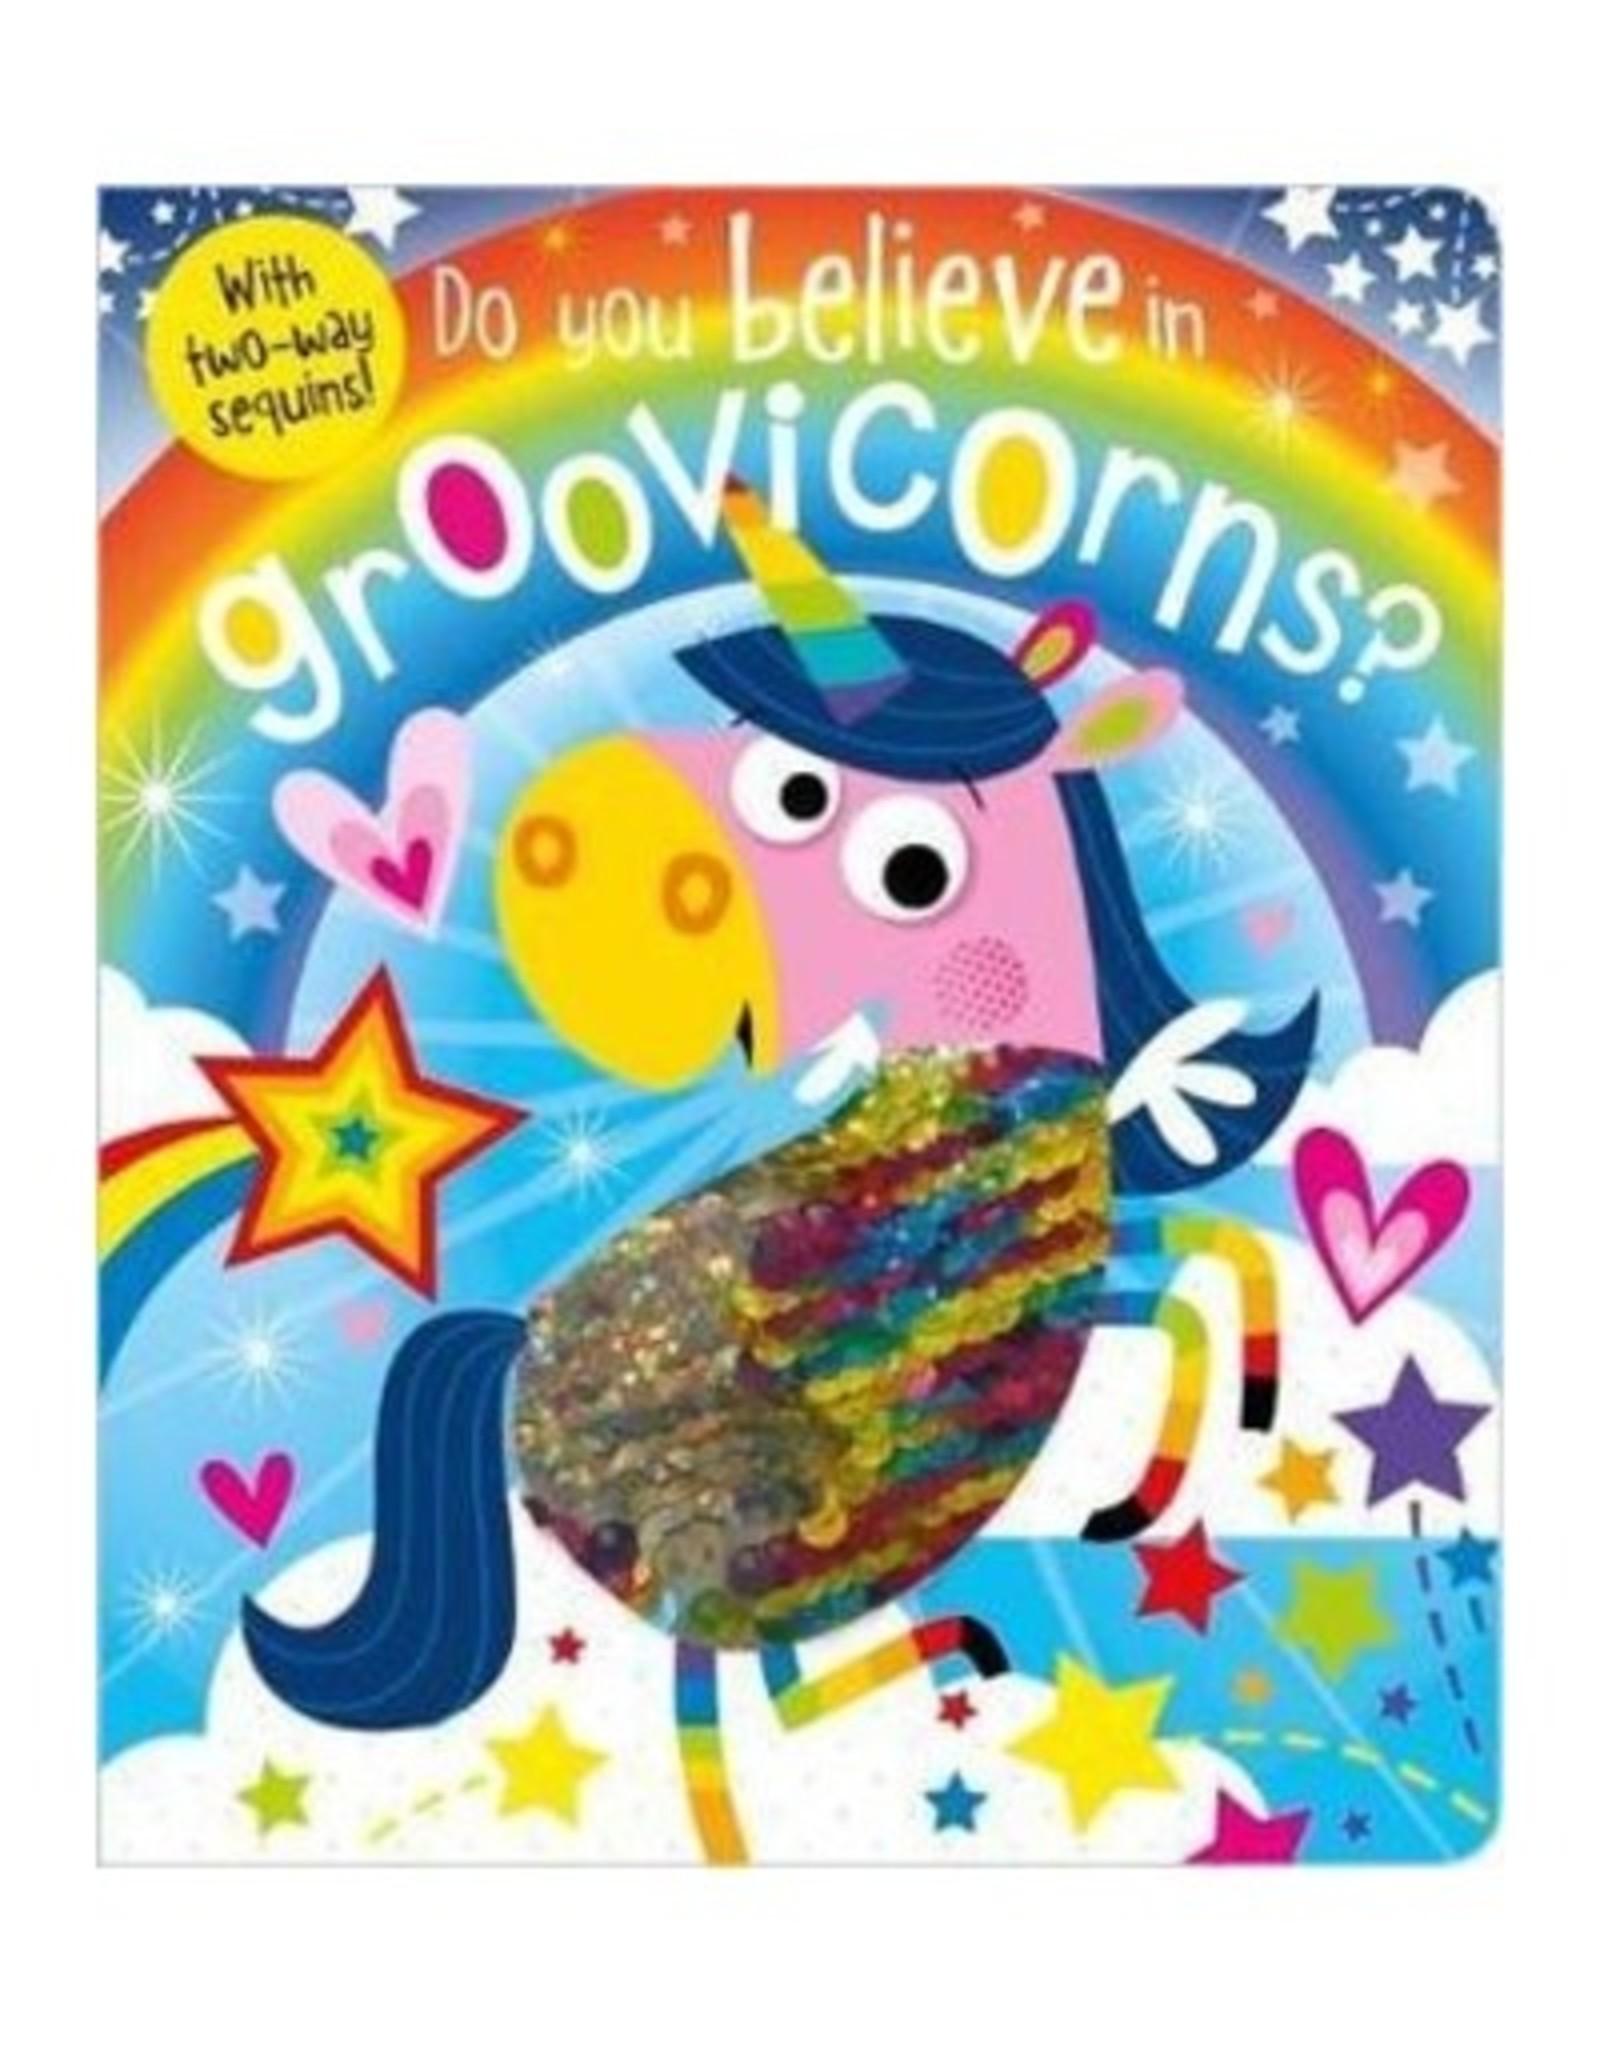 Do You Believe In Groovicorns? 2